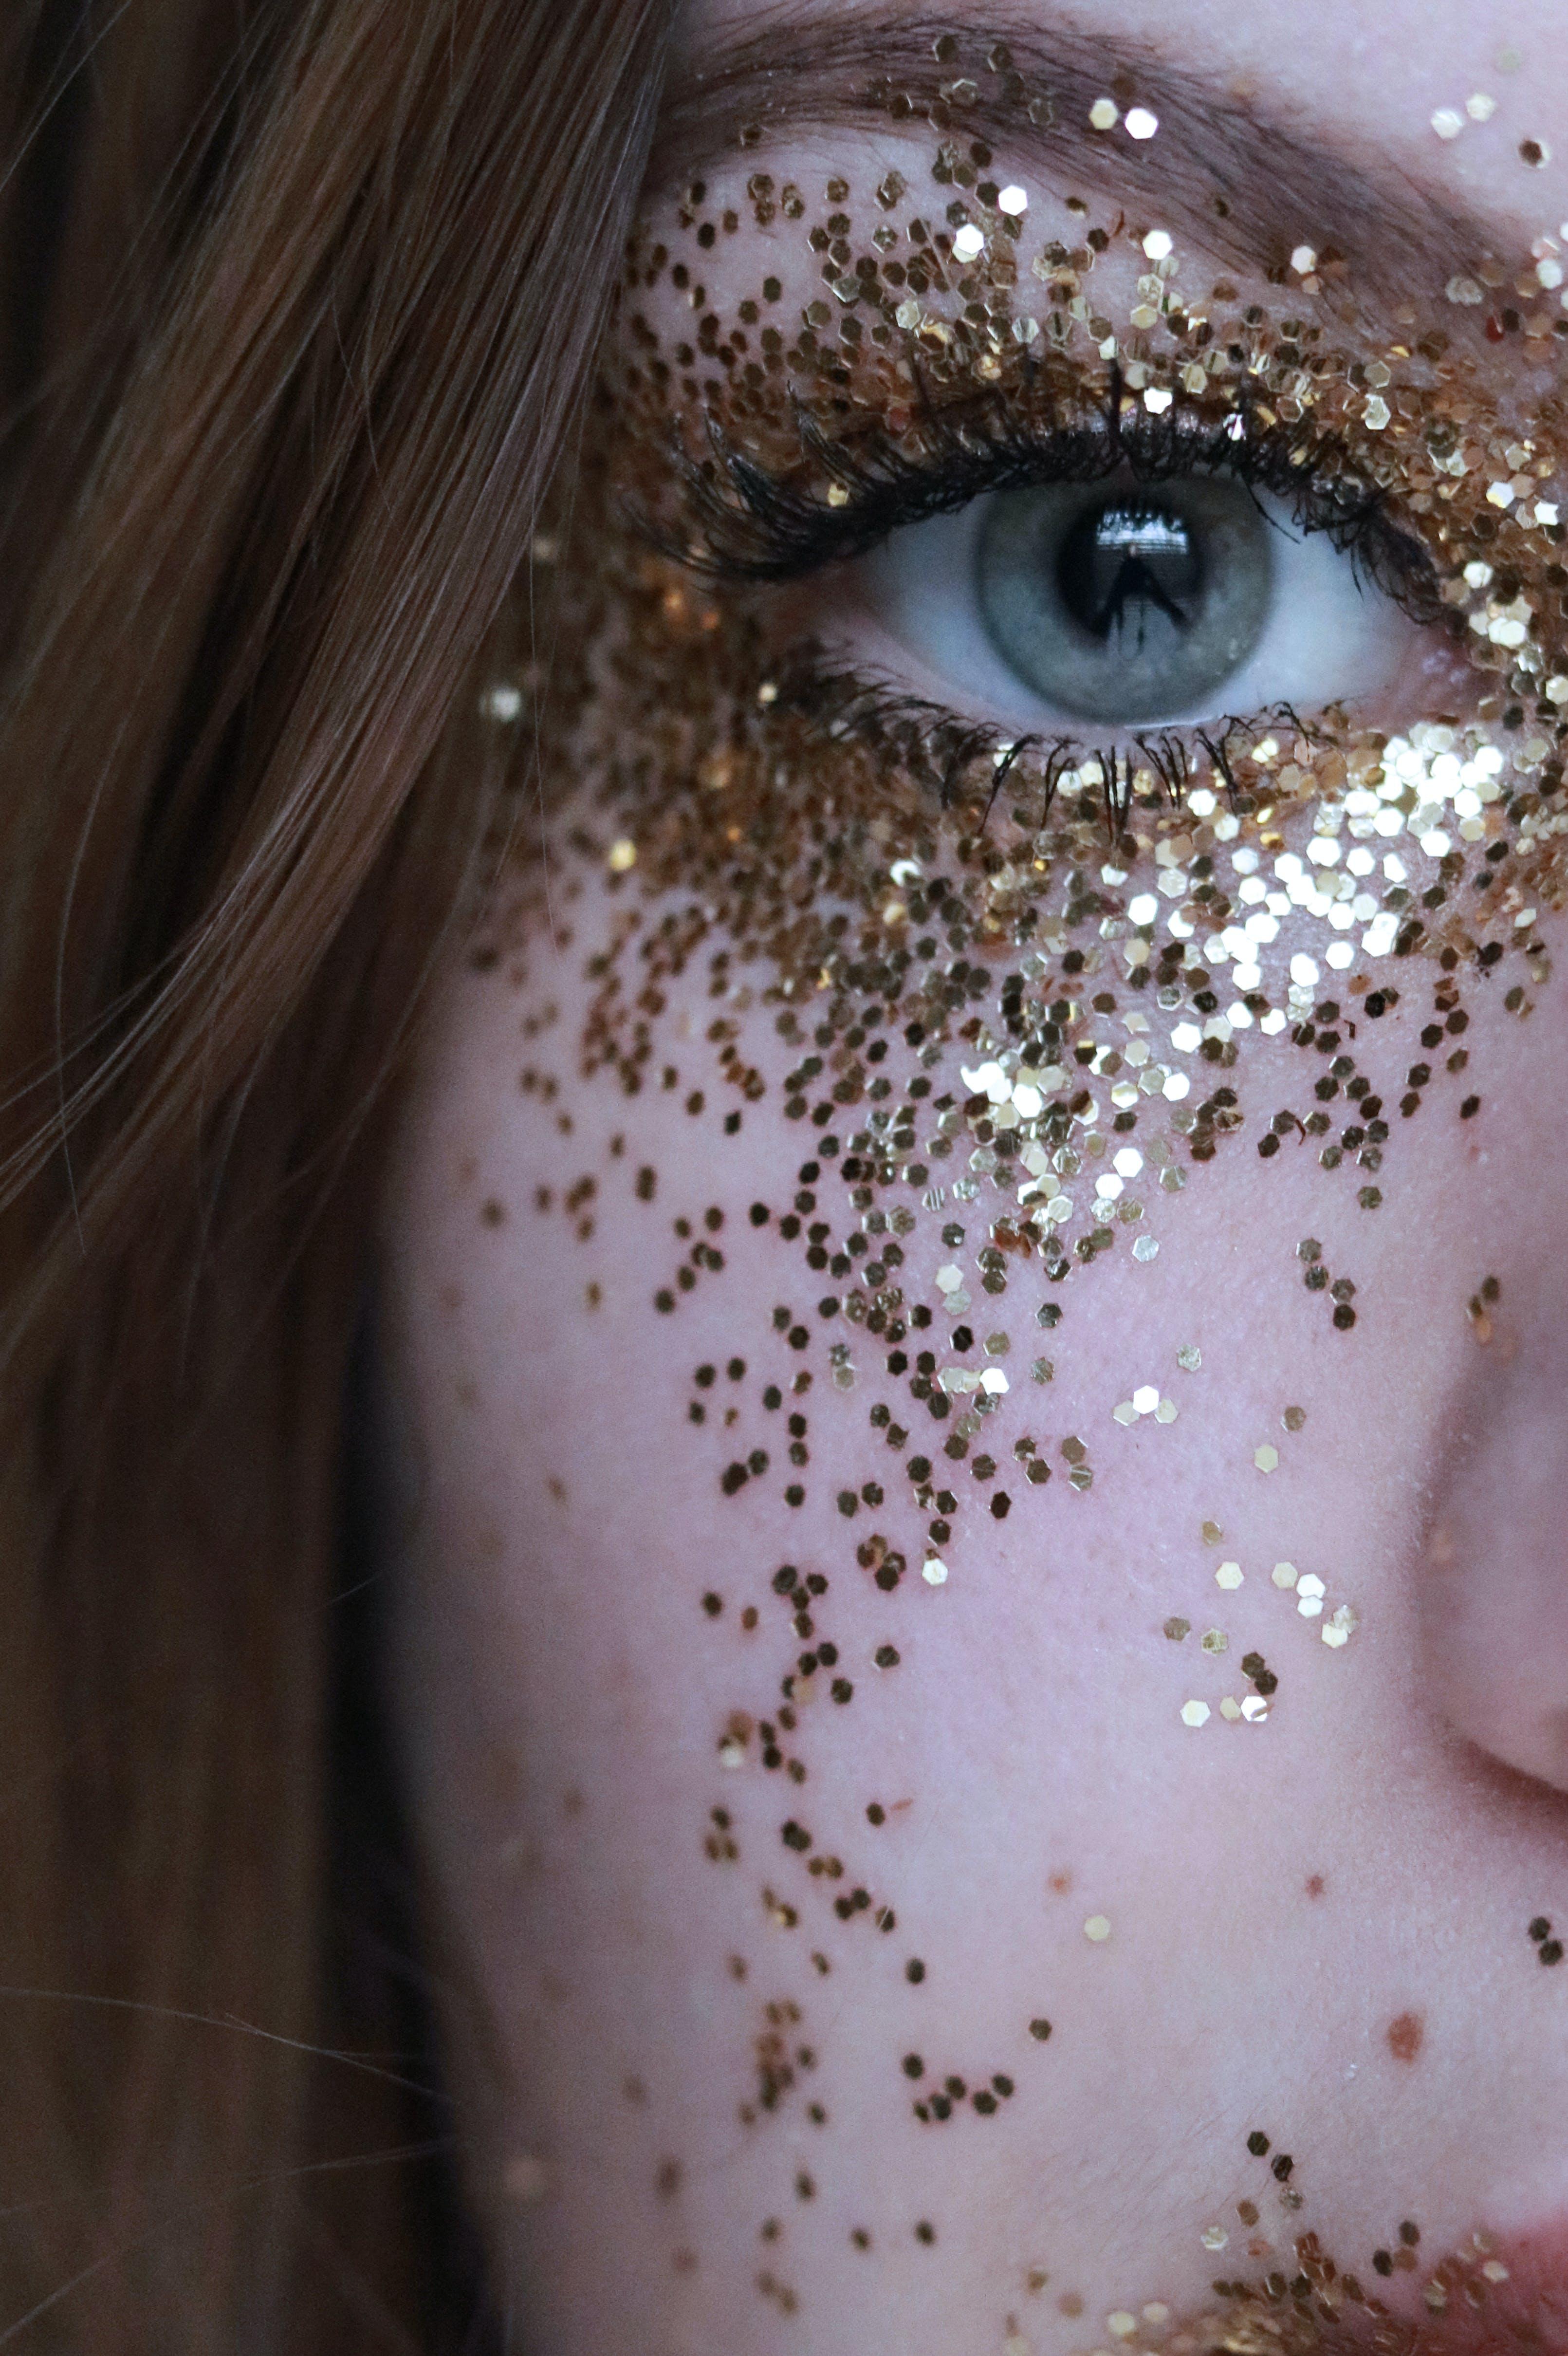 Arany, arc, bőr